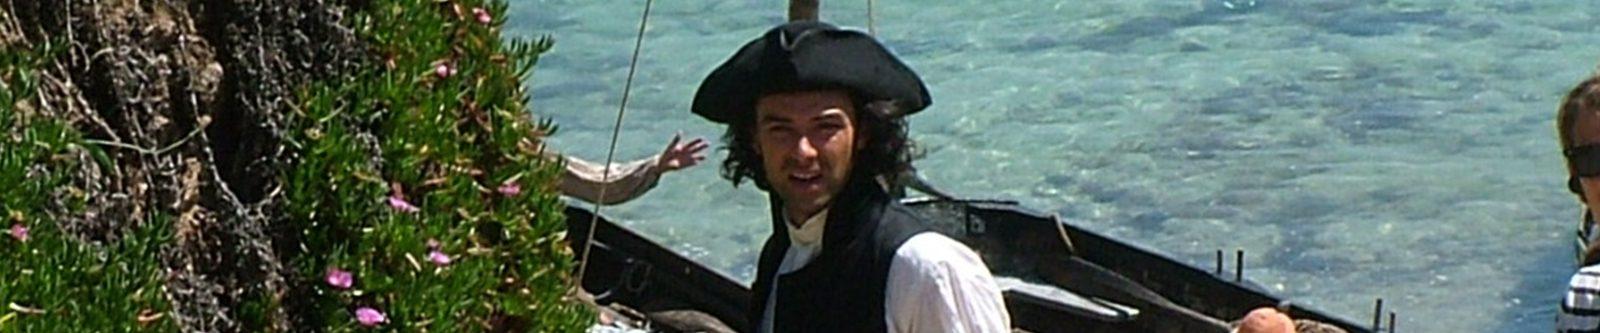 Aidan Turner as Poldark